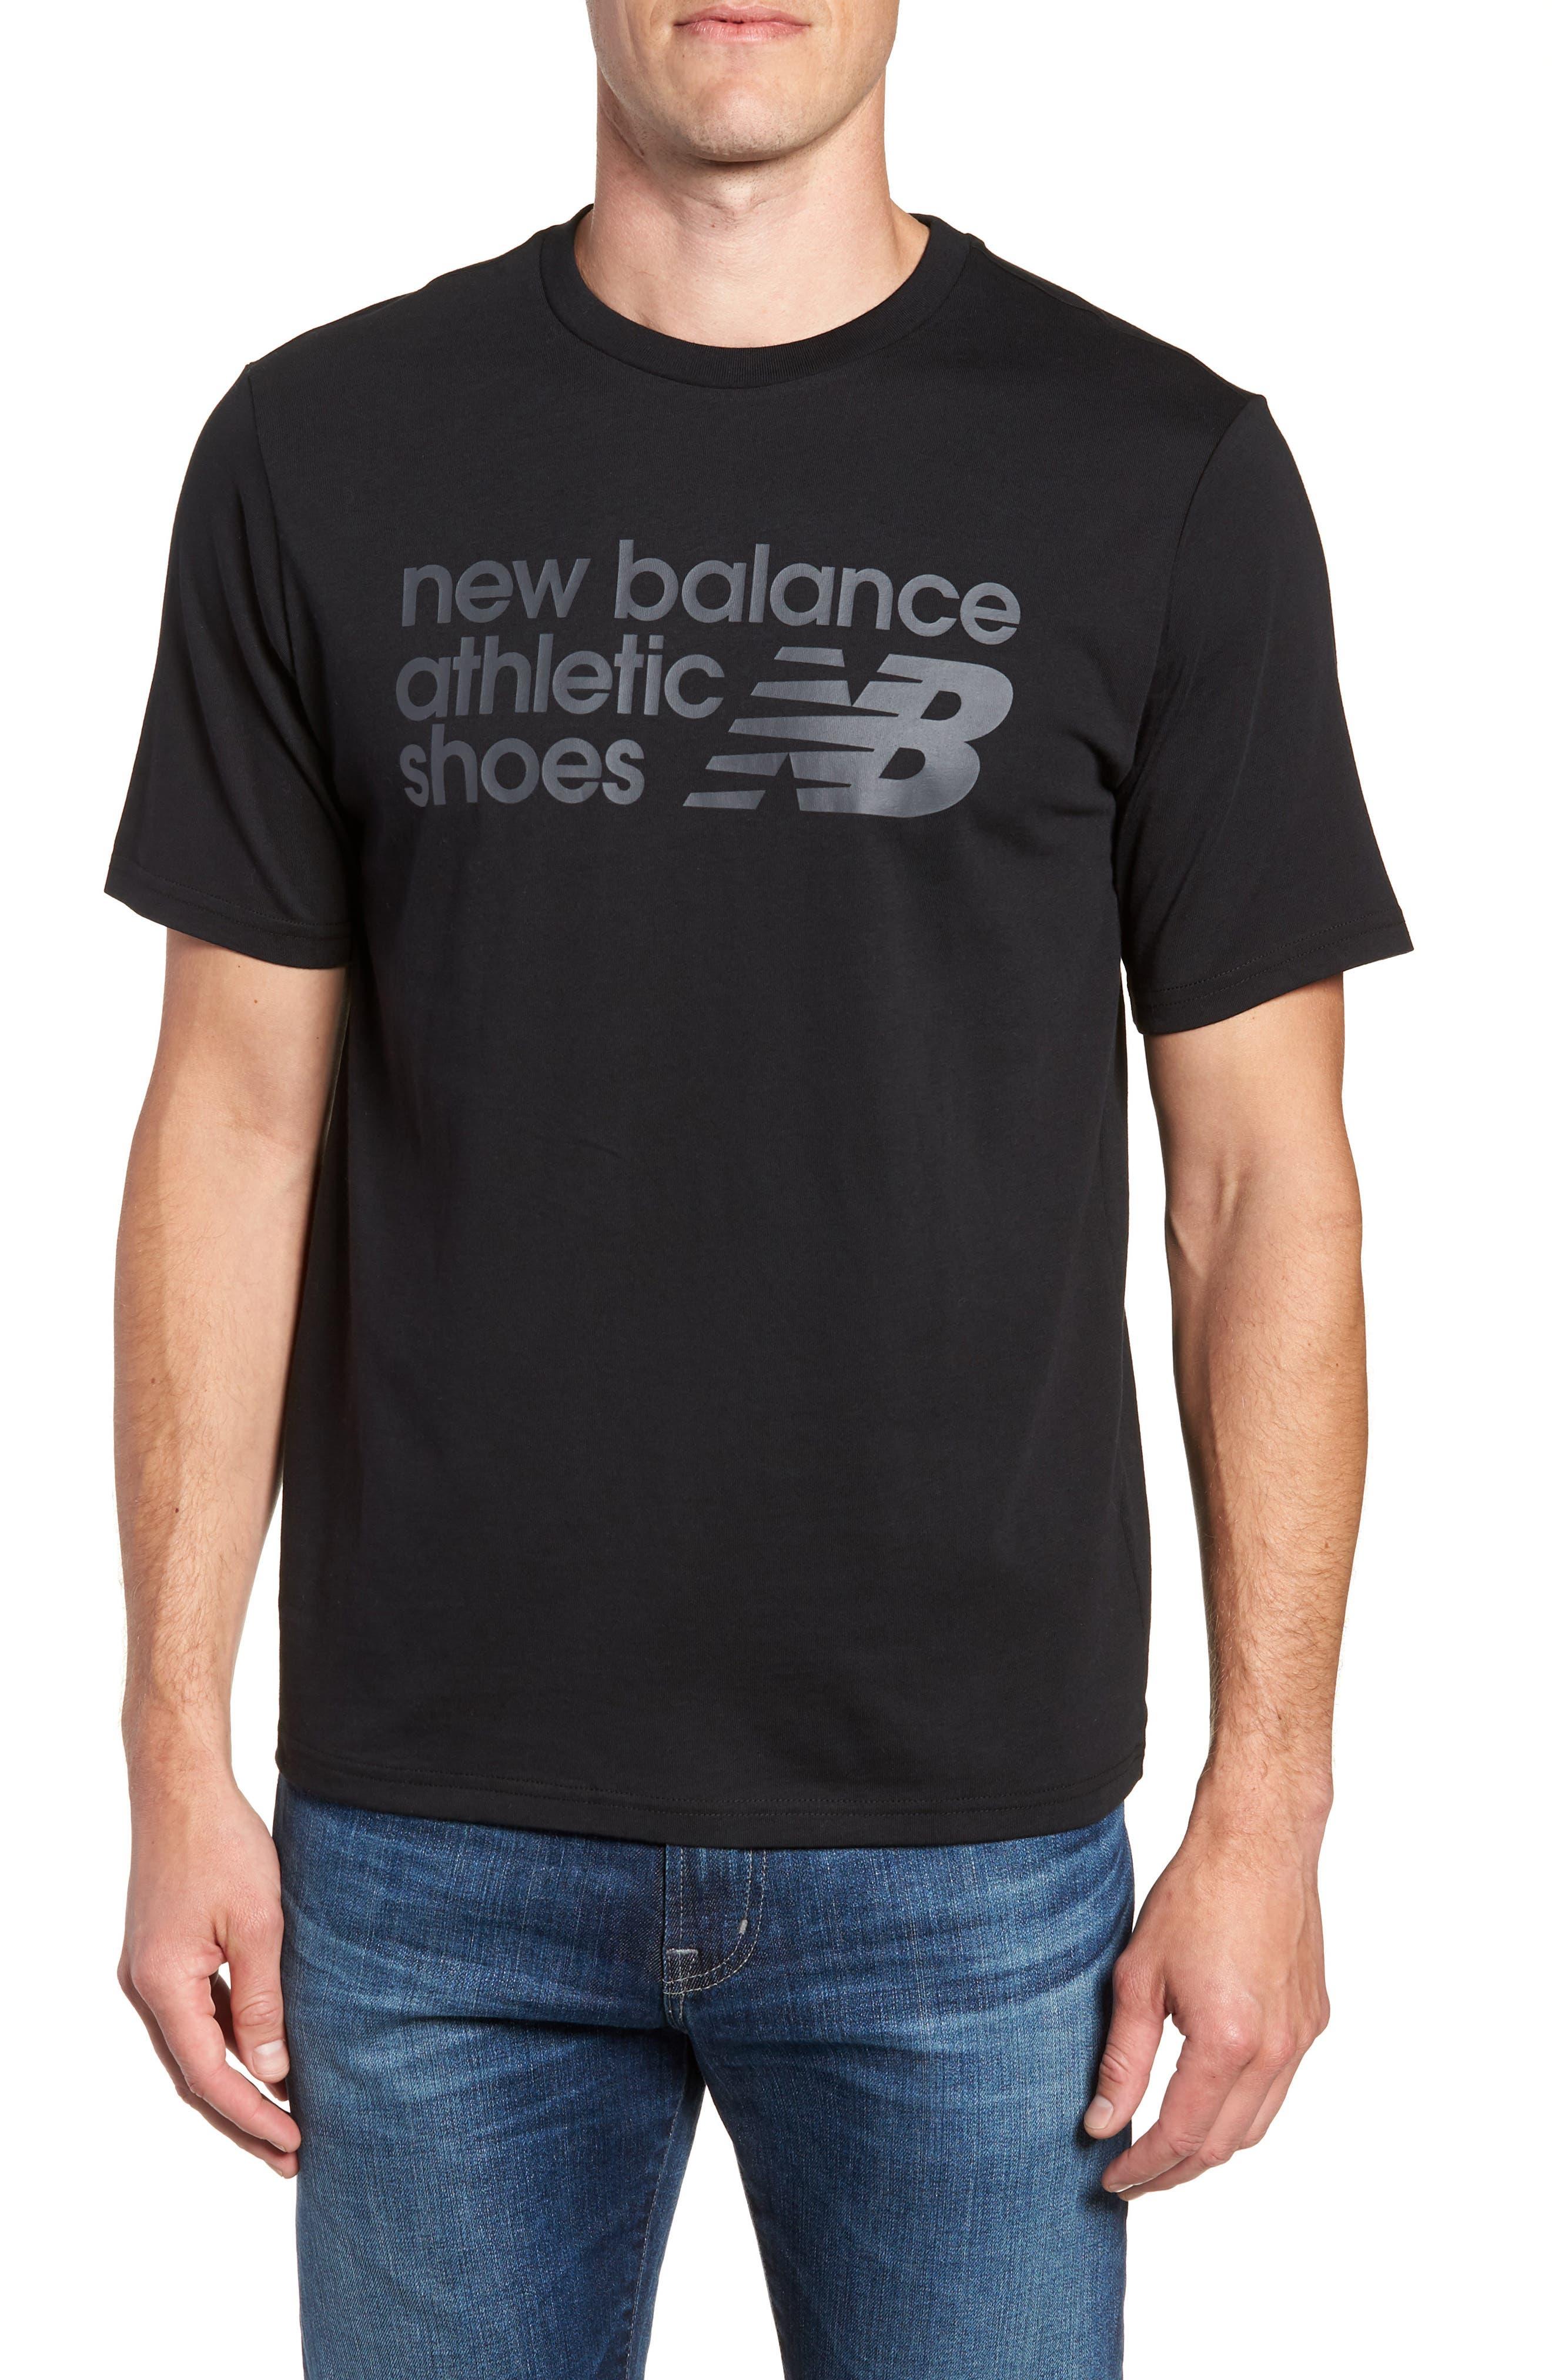 NEW BALANCE NB Shoe Box Graphic T-Shirt, Main, color, BLACK